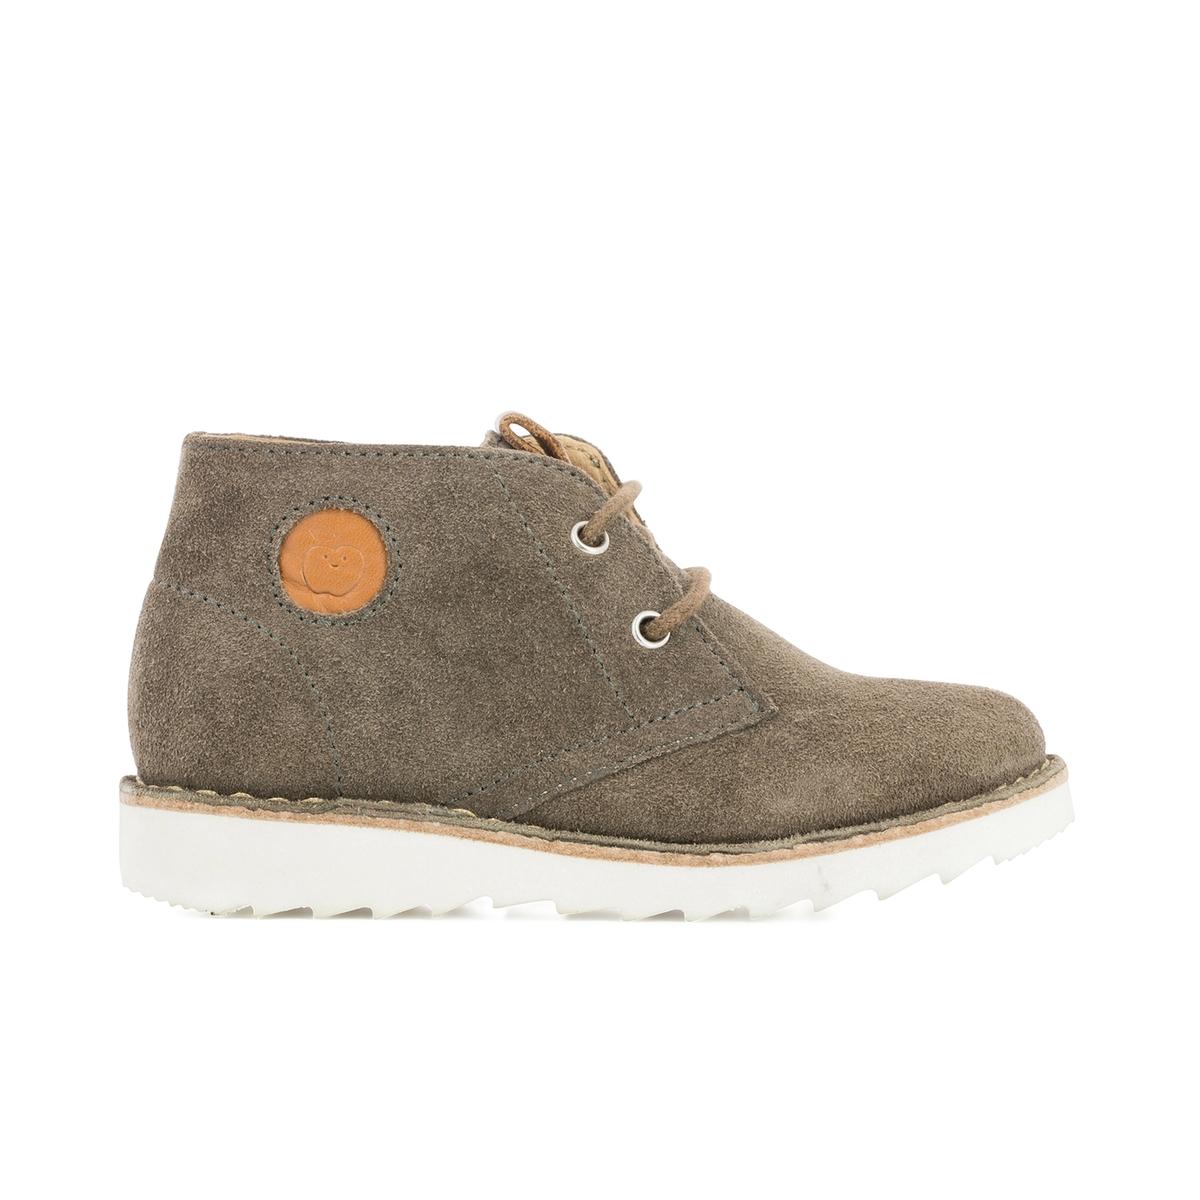 Ботинки-дезерты кожаные MILKY DESERT